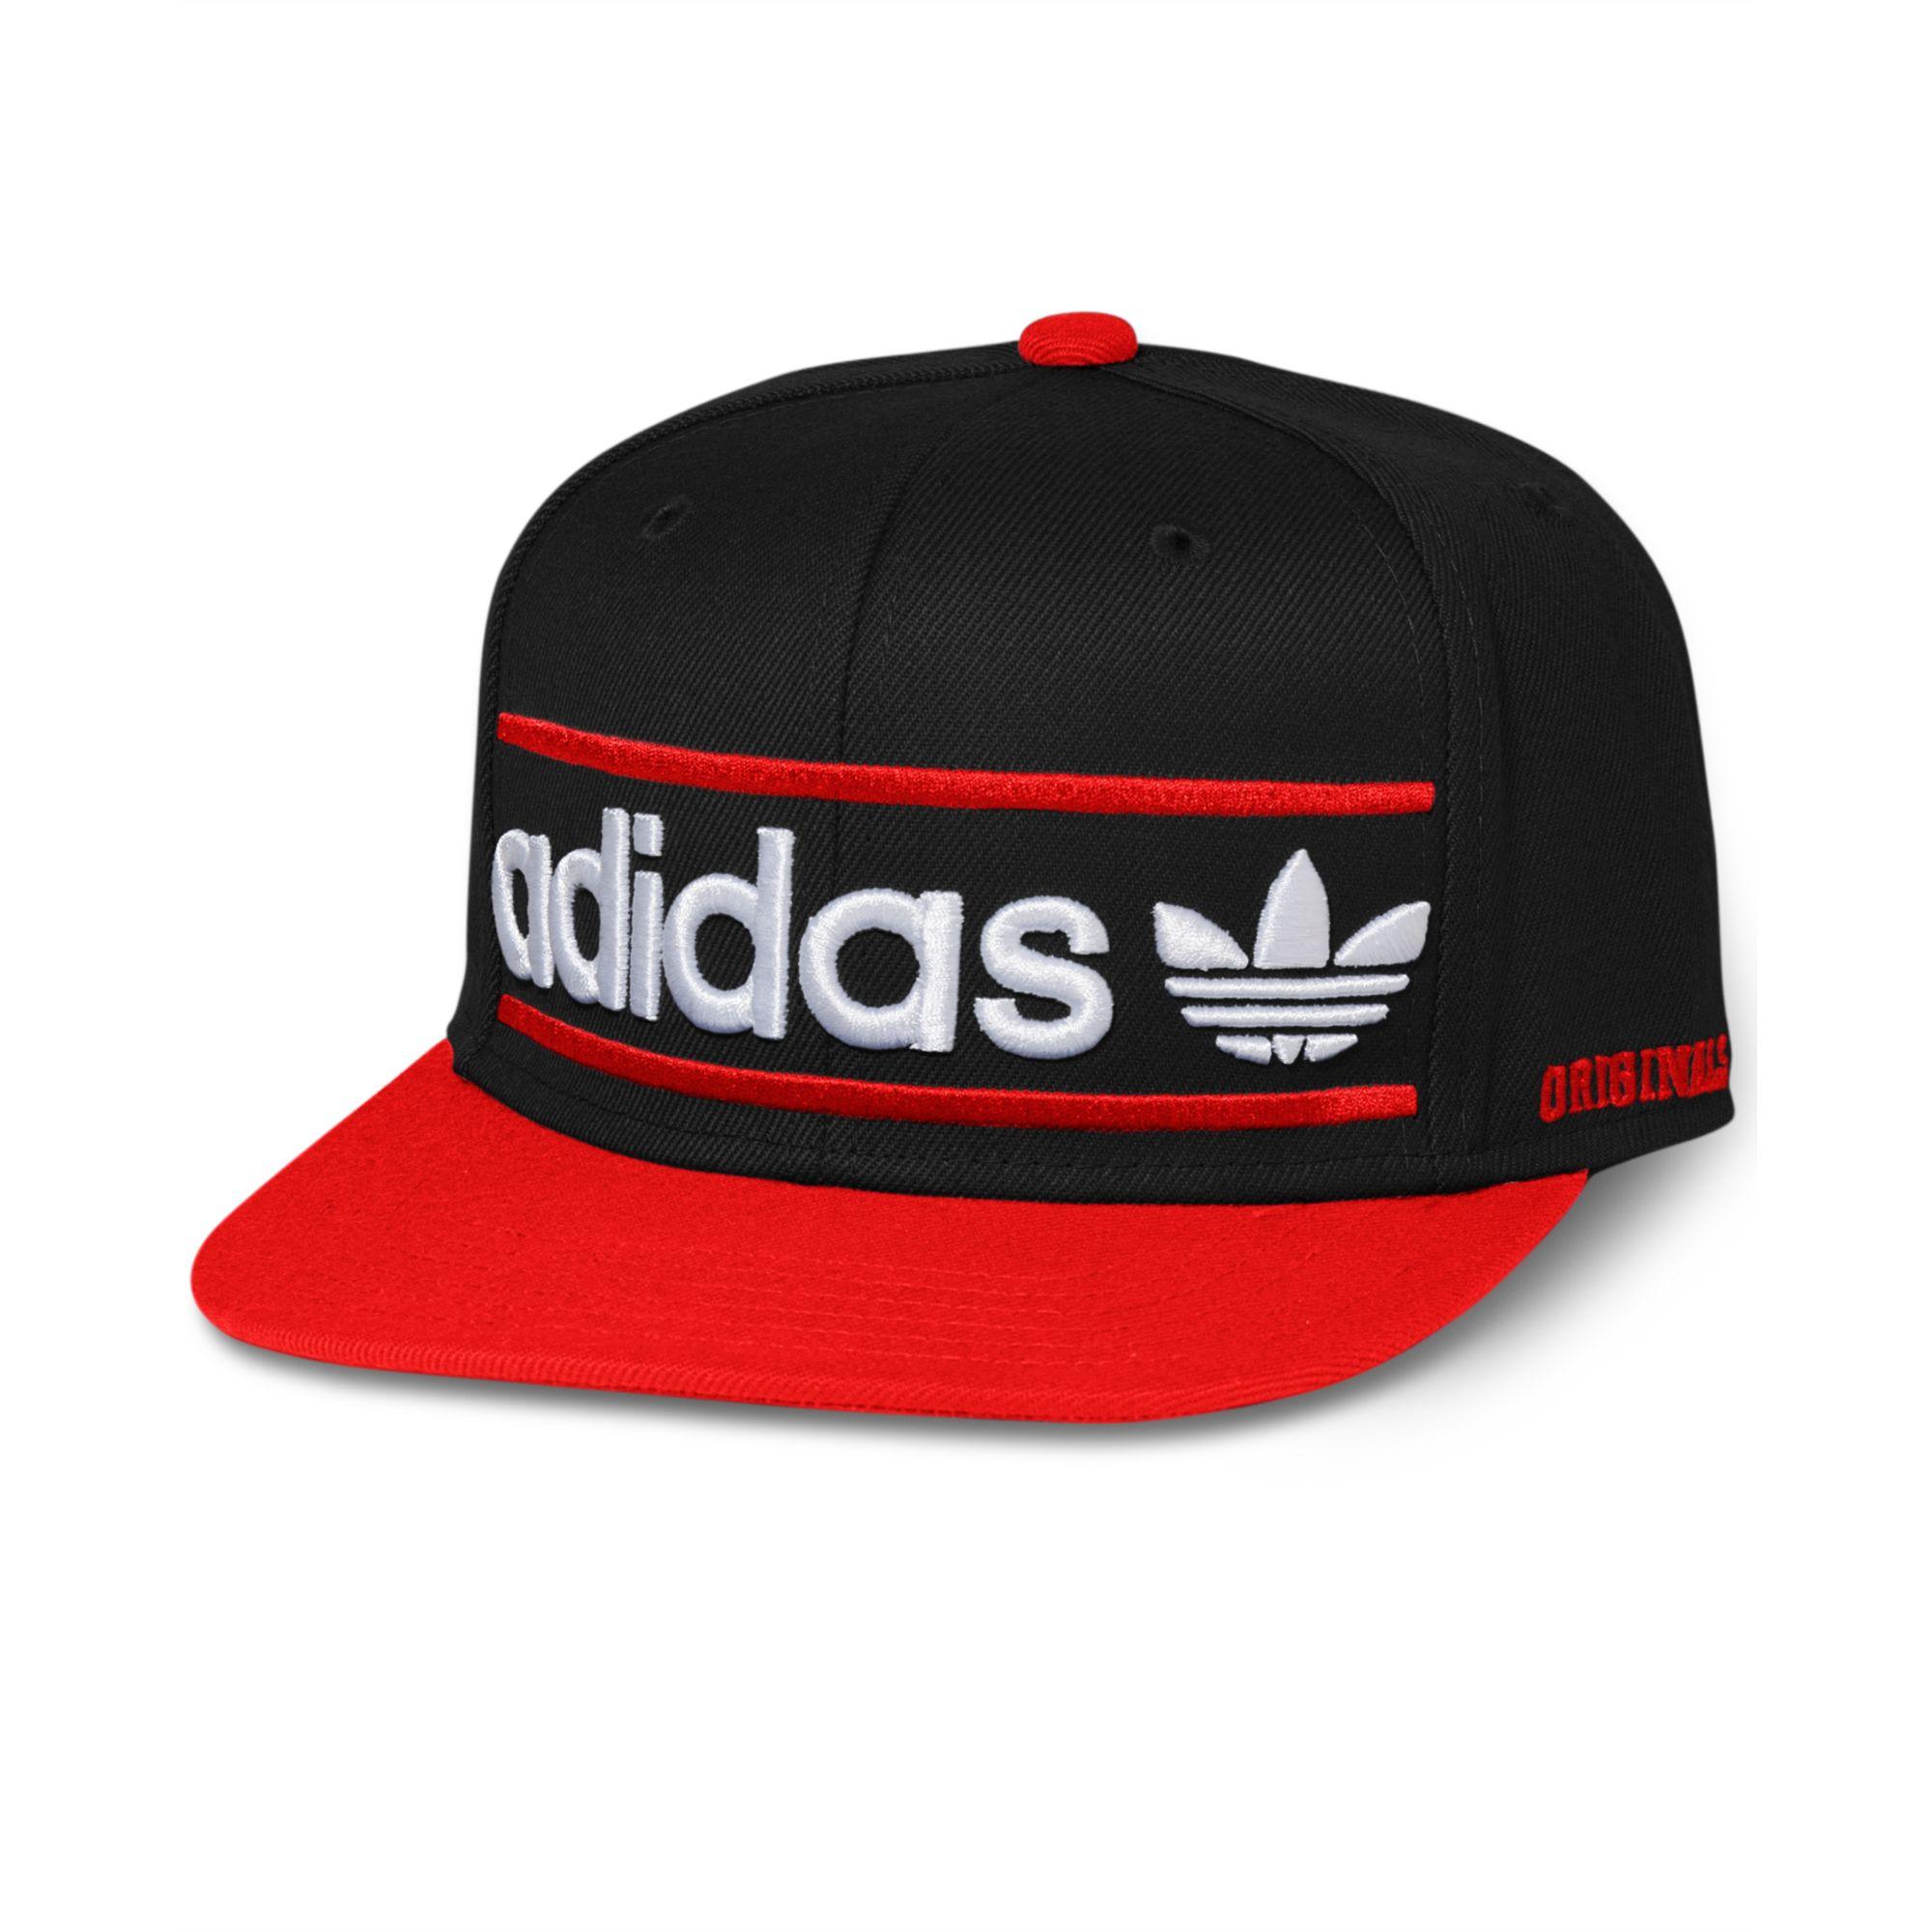 b8ba56bf85571 ... switzerland lyst adidas adi originals heritage snapback cap in black  for men 7916b 506eb